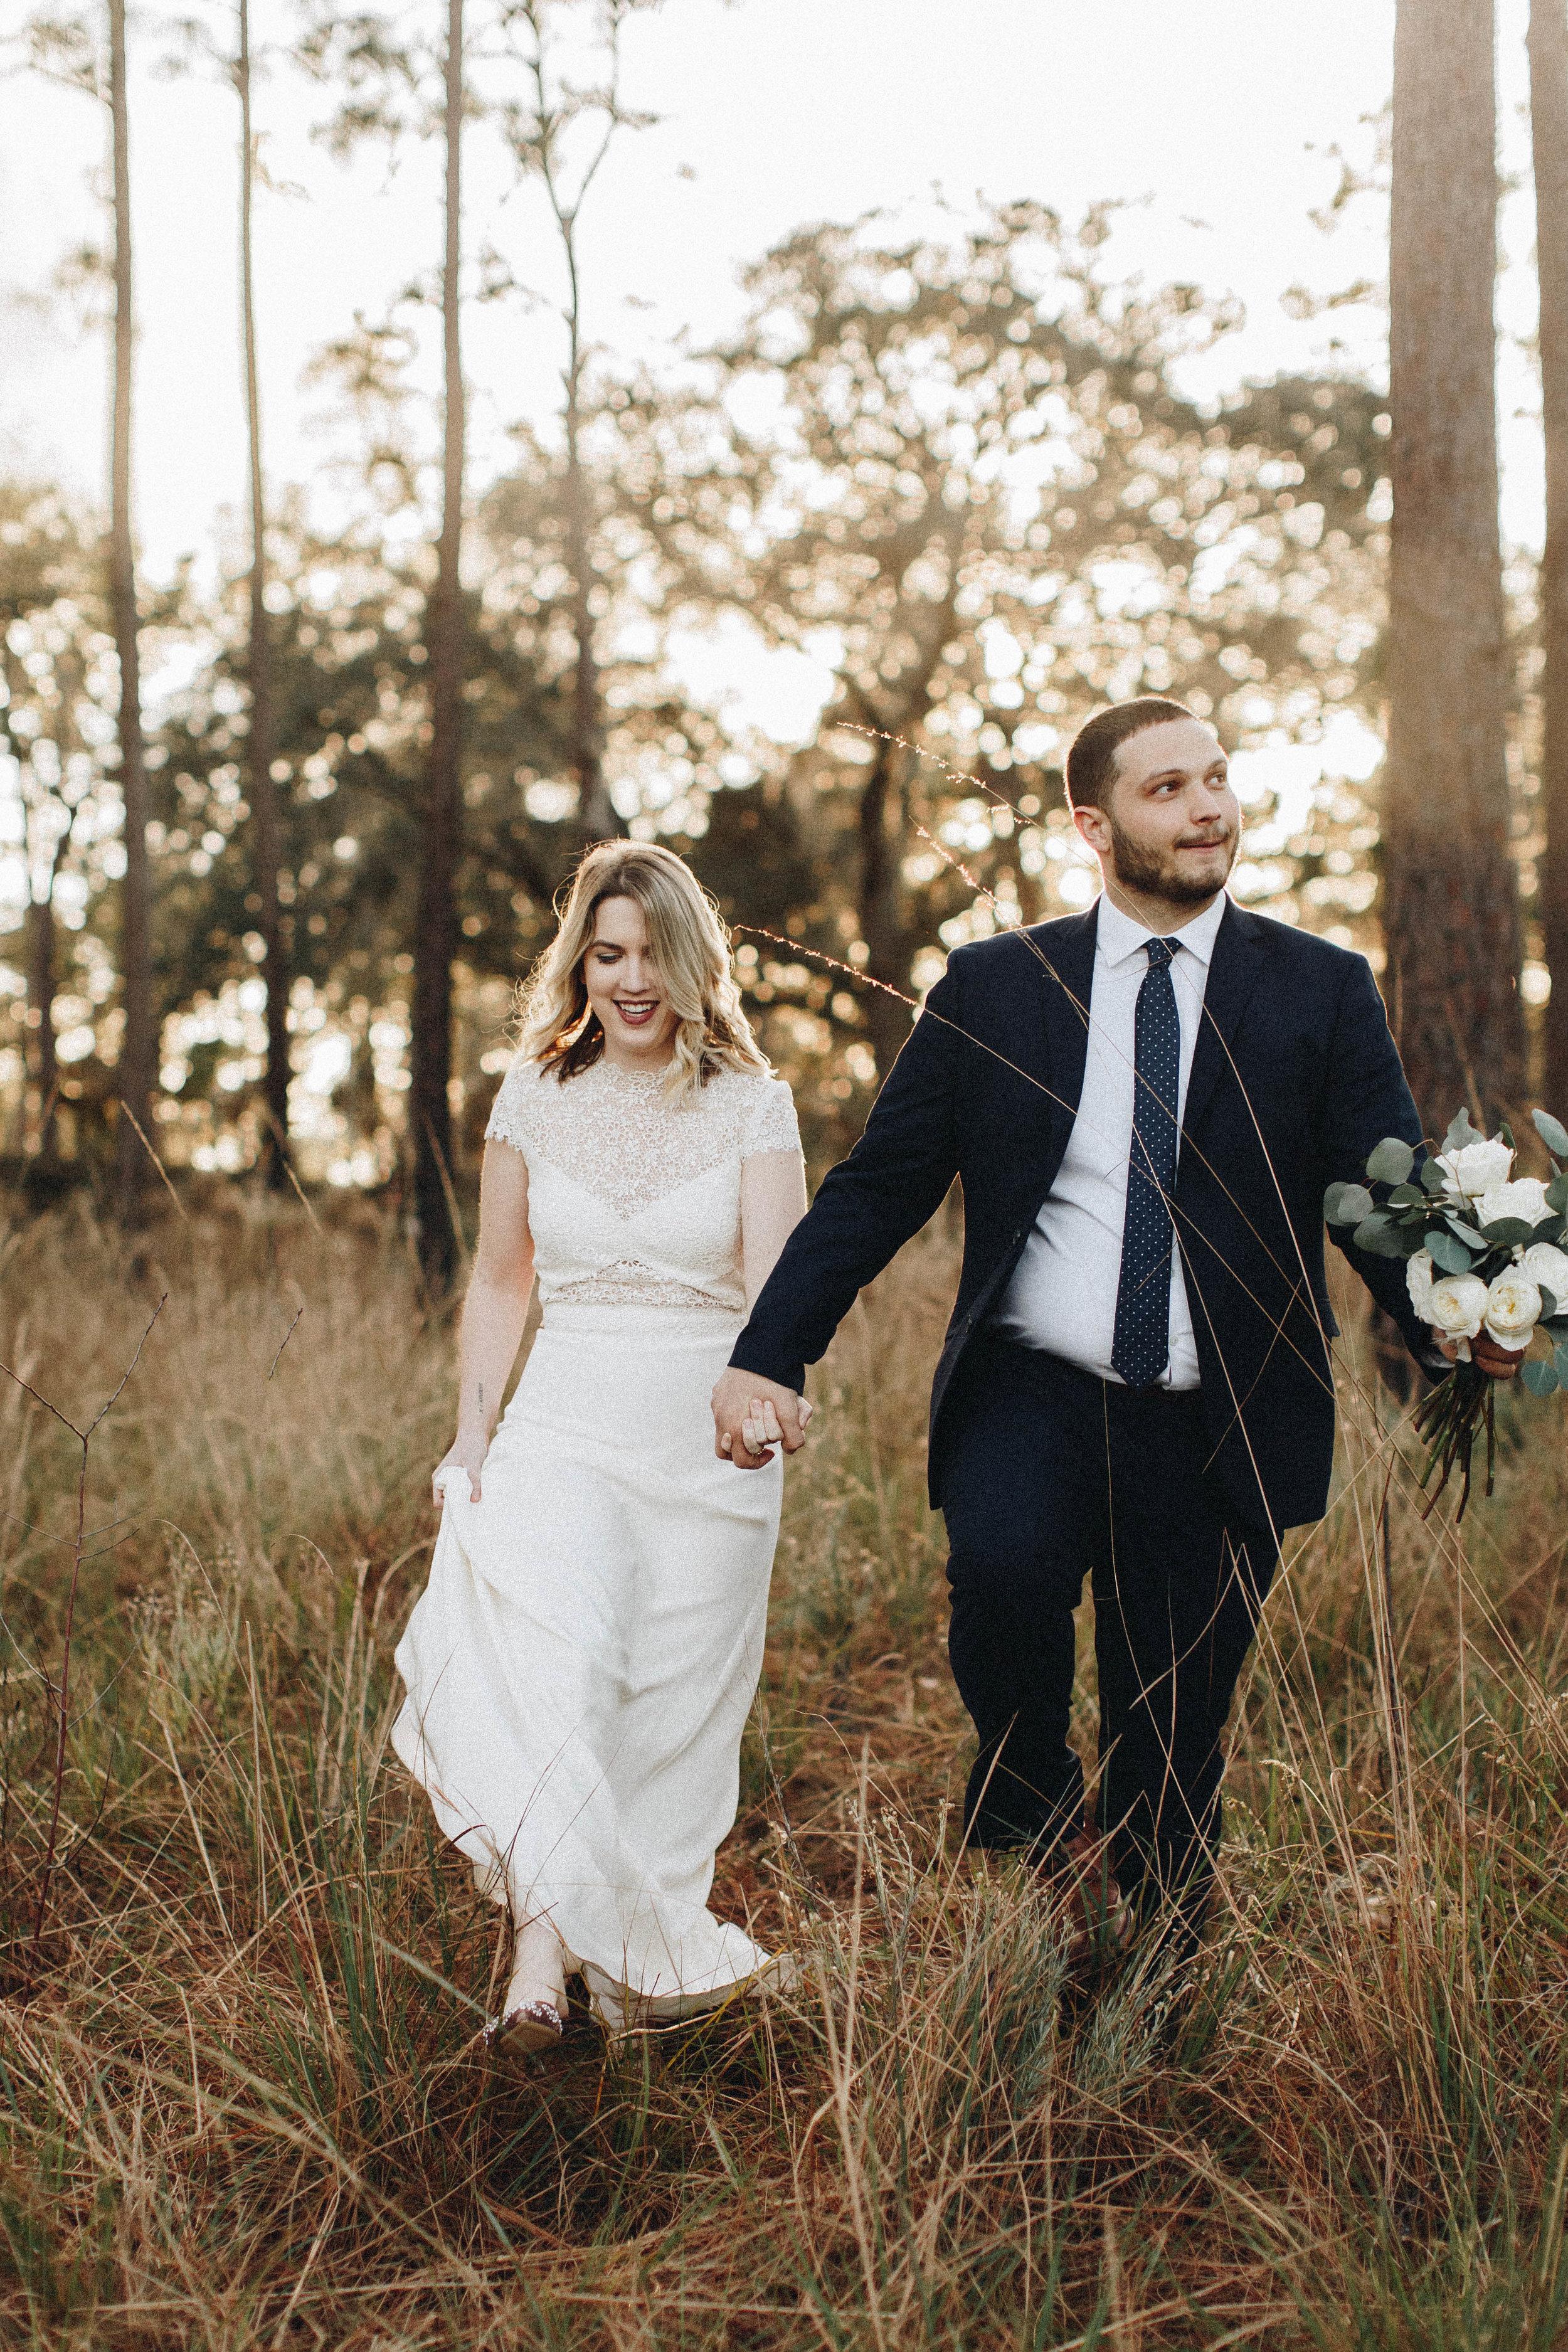 Orlando+wedding+photographer-24.jpeg